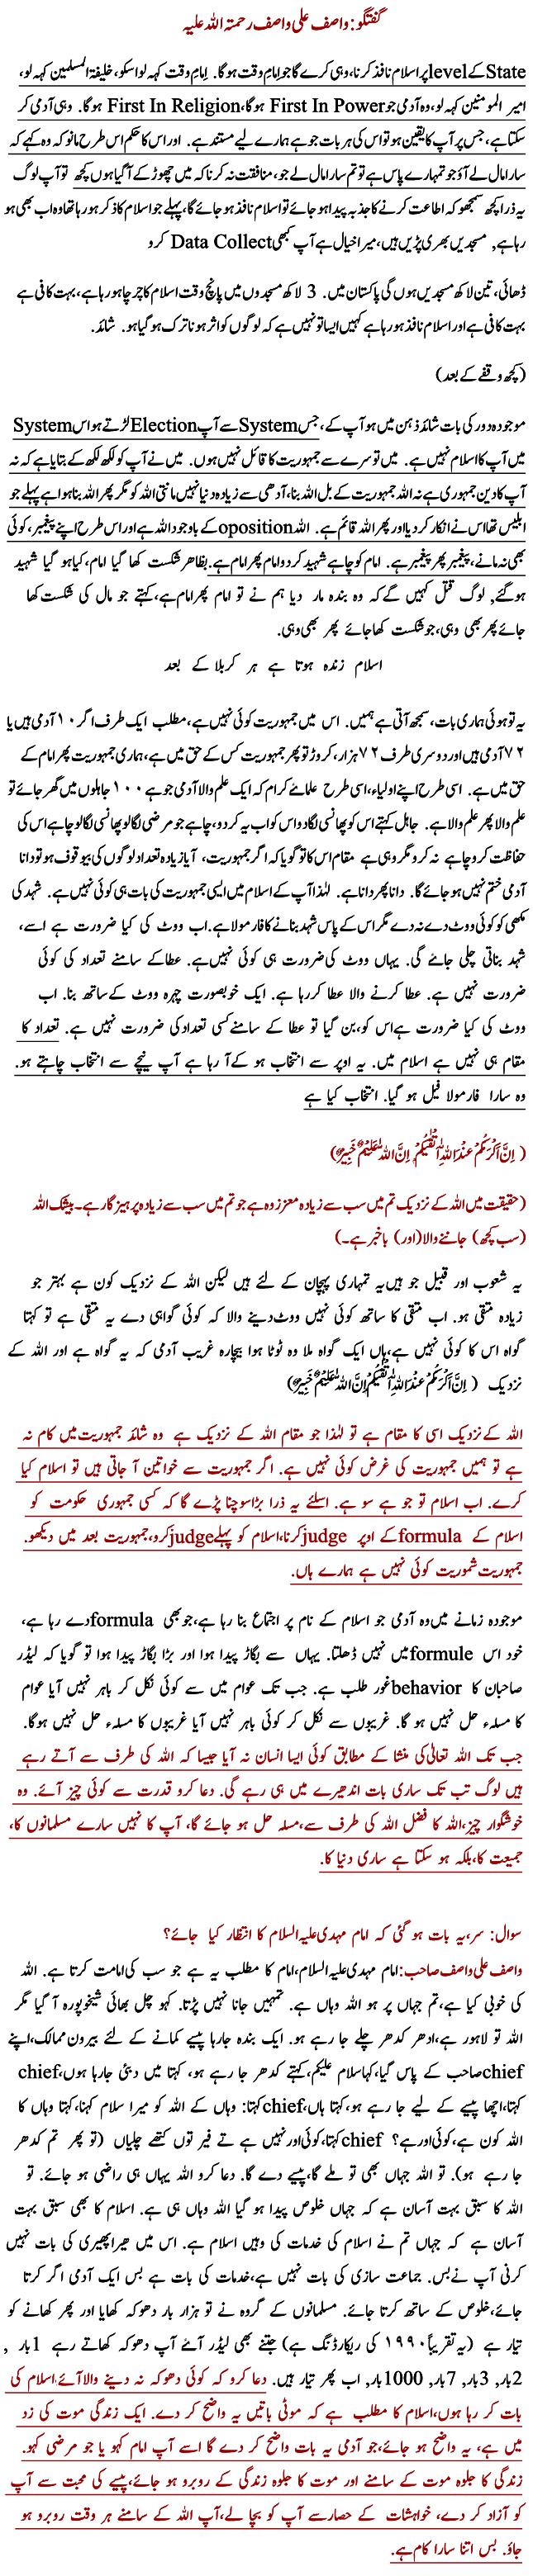 essay on mother in urdu urdu essay site essay topics urdu essay  urdu essay site essay on time in urdu cv format for freshers mca internship cover rebel